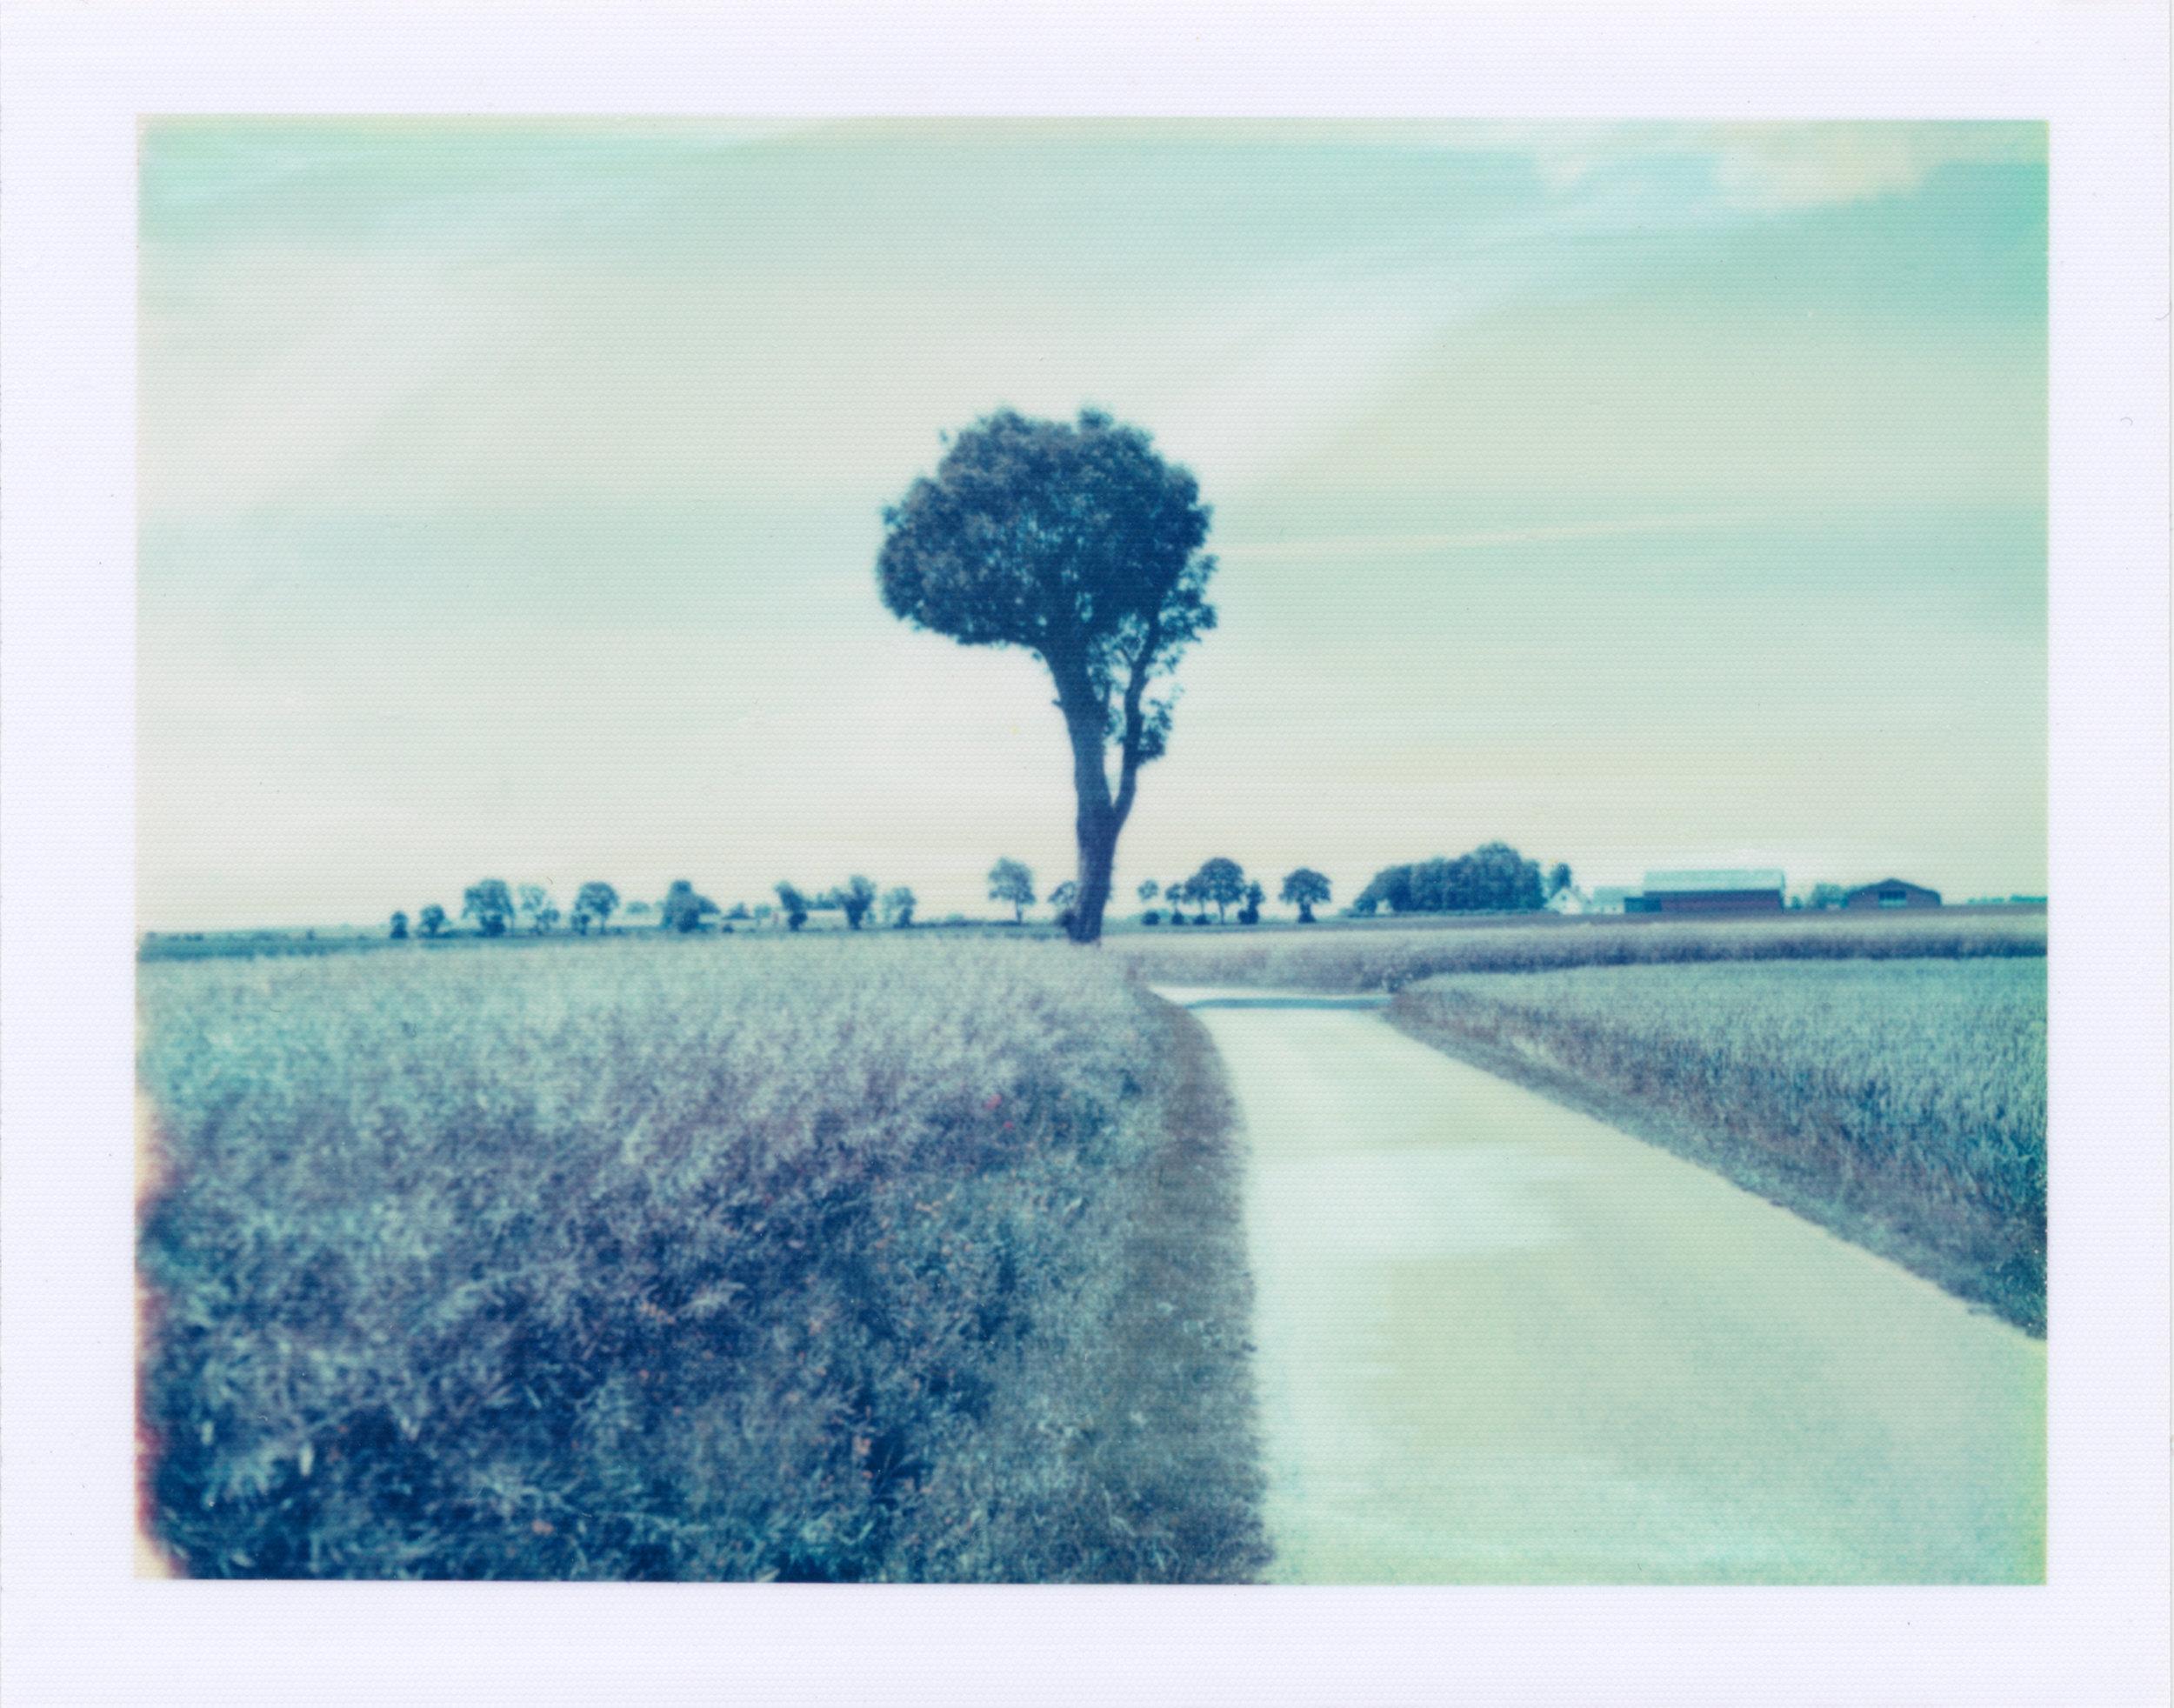 Field Road Tree | Polaroid 195 | Polaroid 669 | Per Forsström